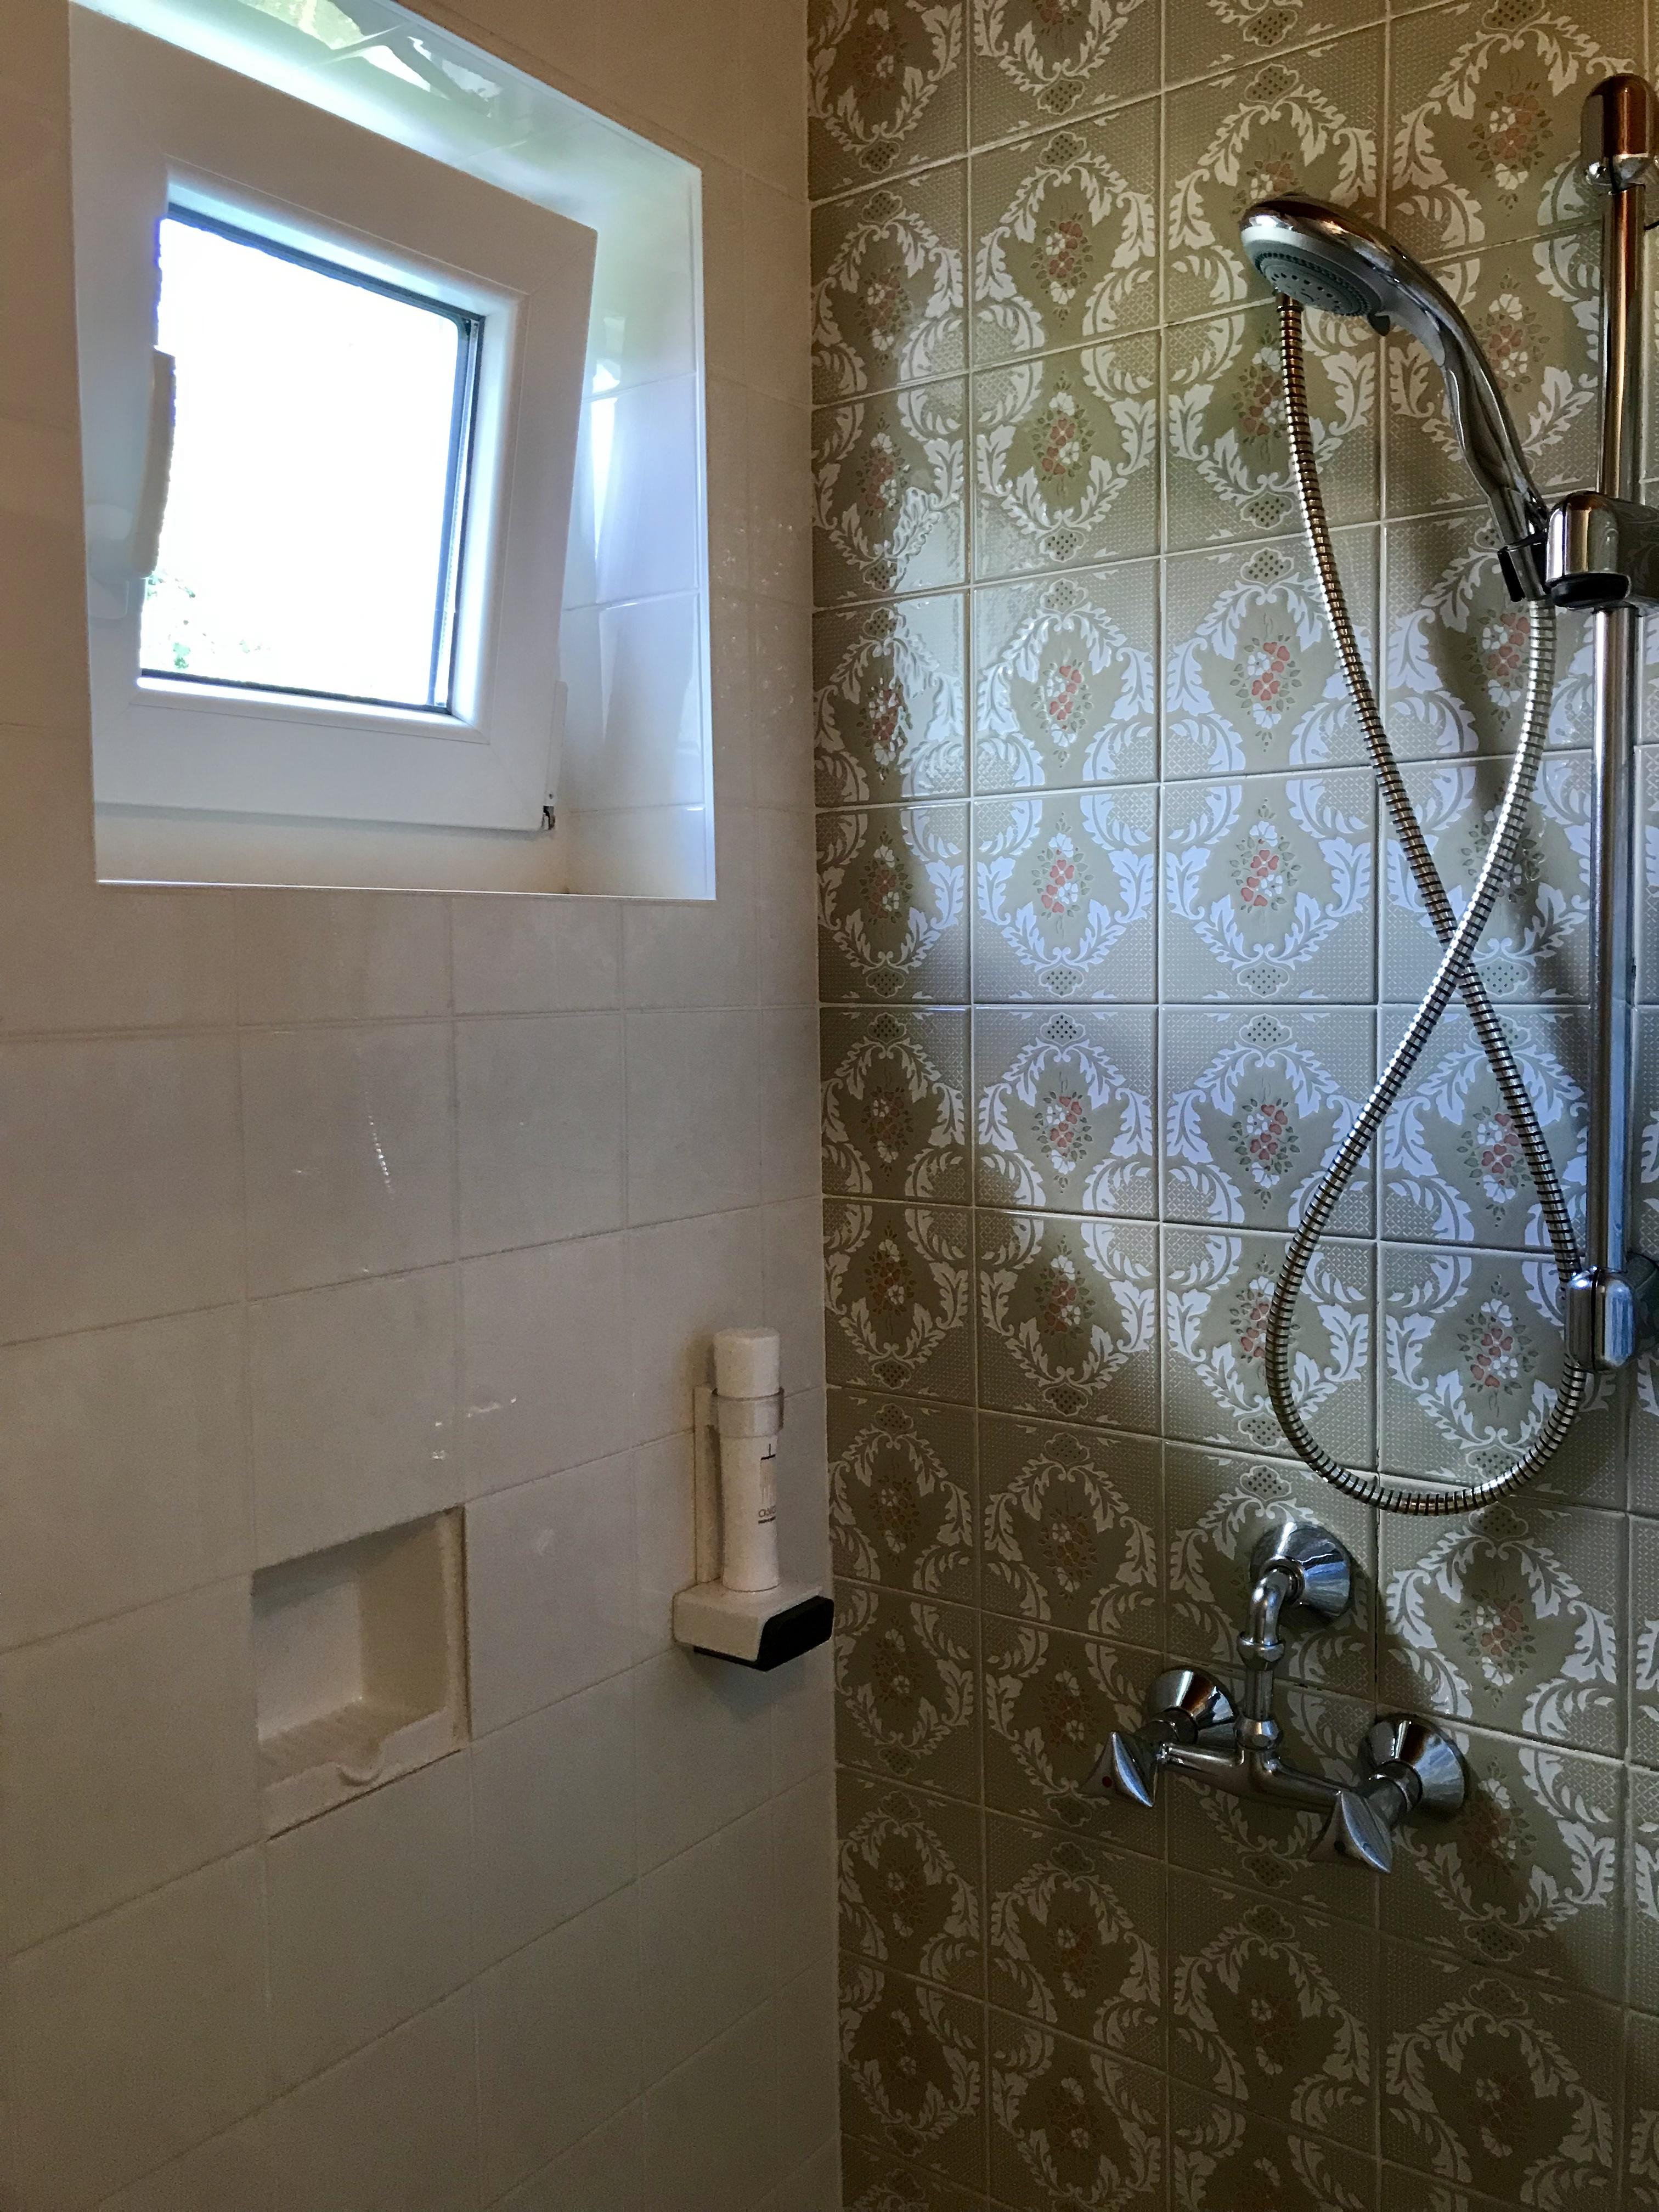 Zimmer Nr. 5 - Dusche